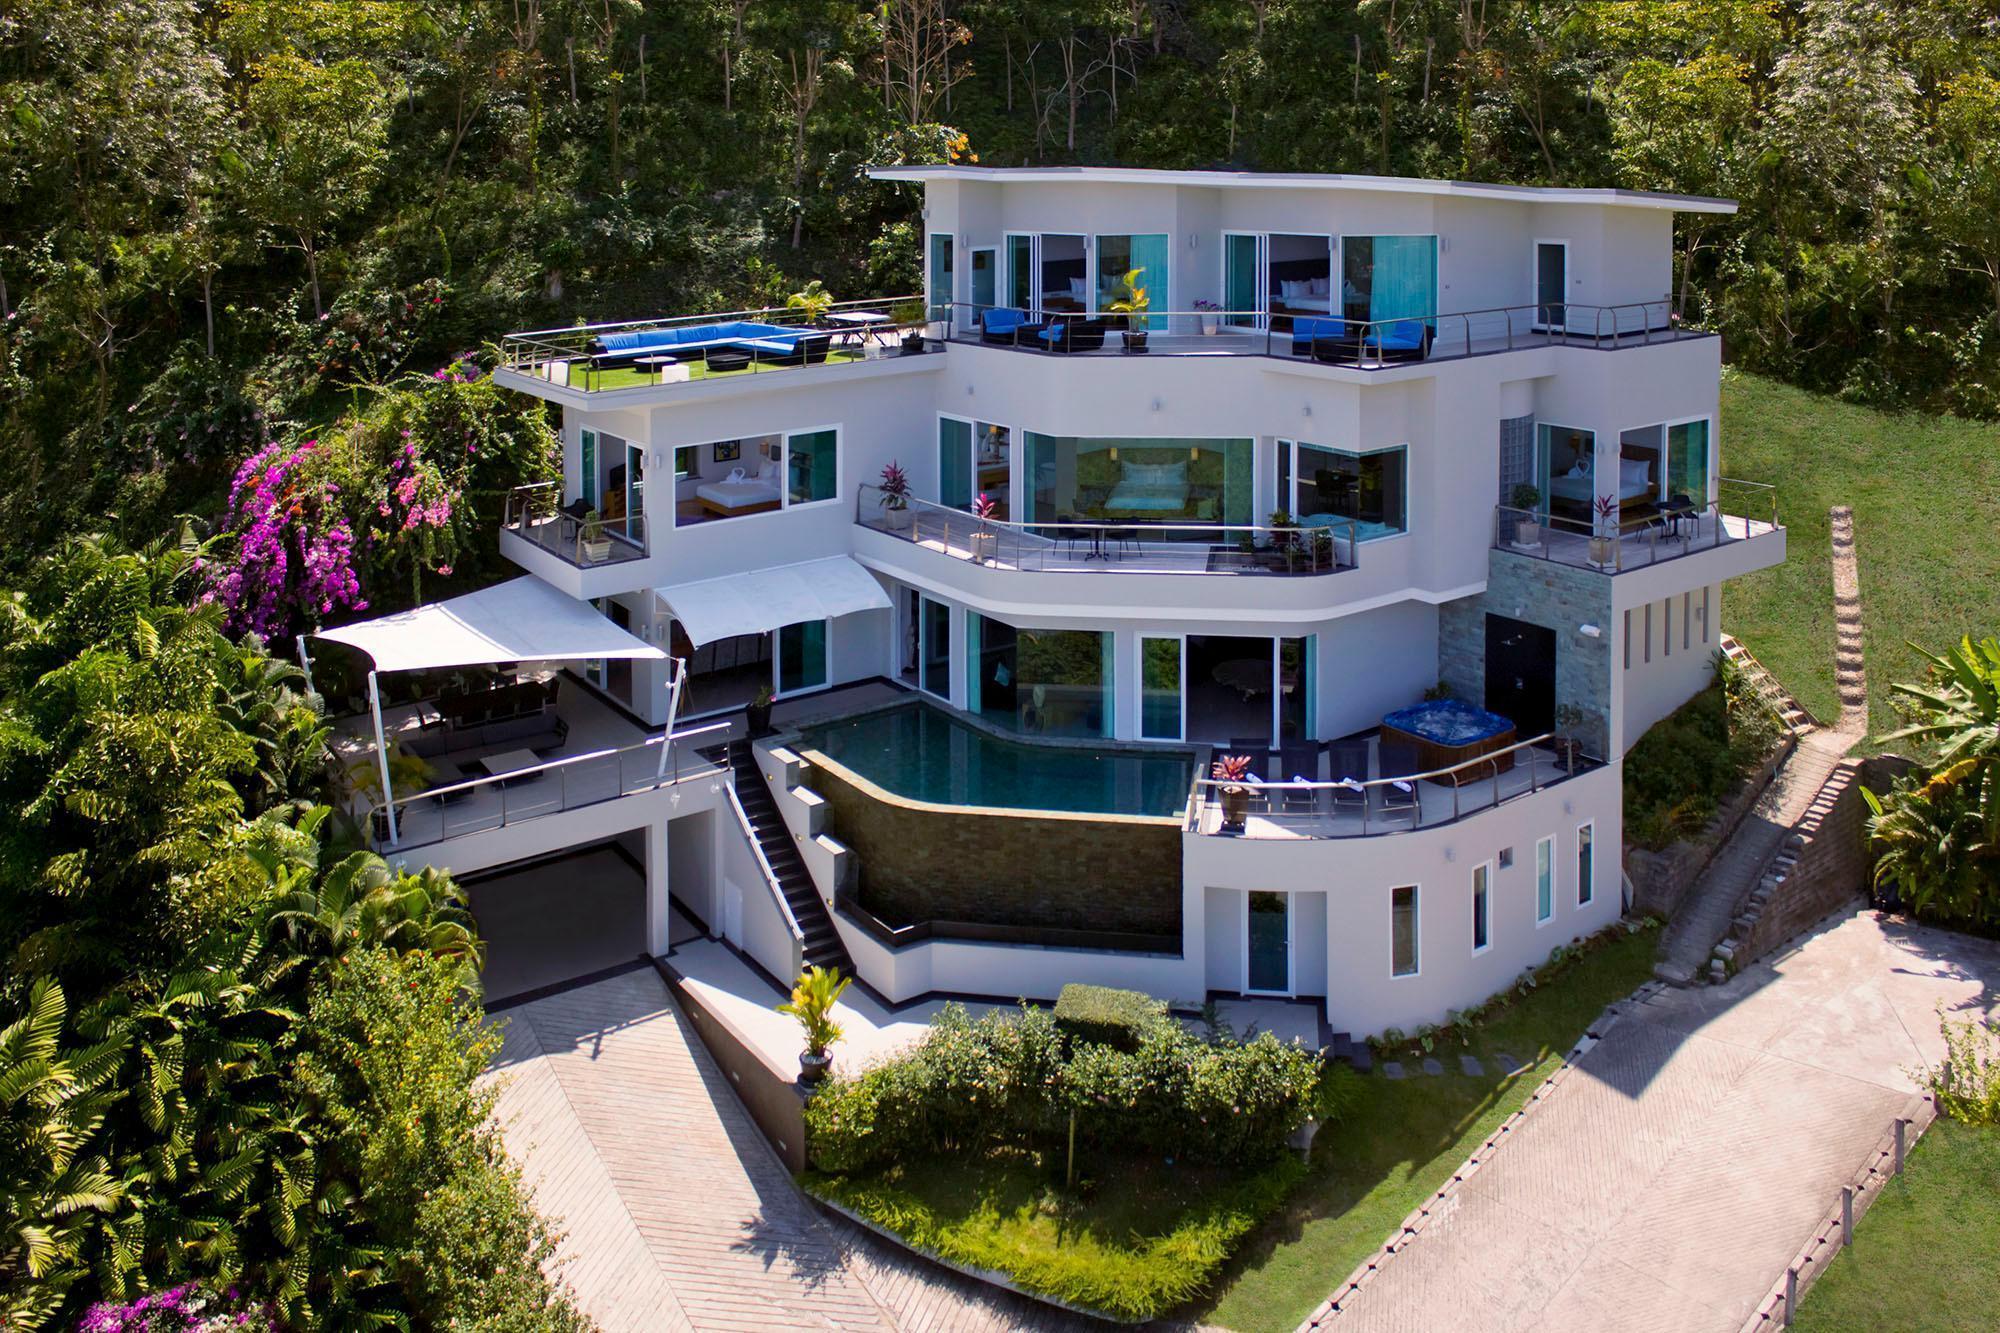 Villa Namaste 6 BedroomFullyStaffed OceanViewVilla วิลลา 6 ห้องนอน 8 ห้องน้ำส่วนตัว ขนาด 950 ตร.ม. – สุรินทร์